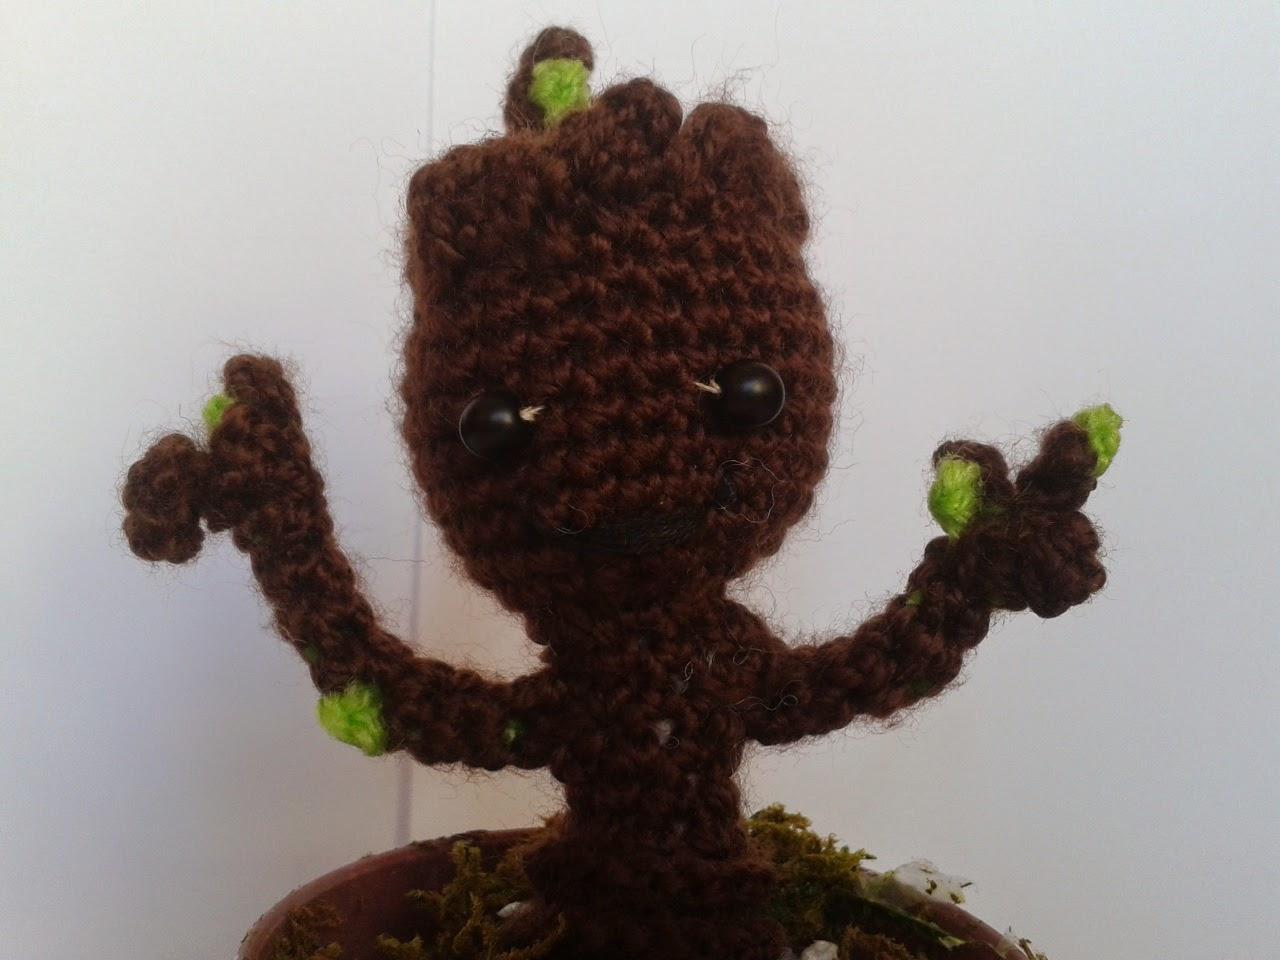 DIY PATTERN Baby Groot vol2 Amigurumi Crochet Pattern | Etsy | 960x1280